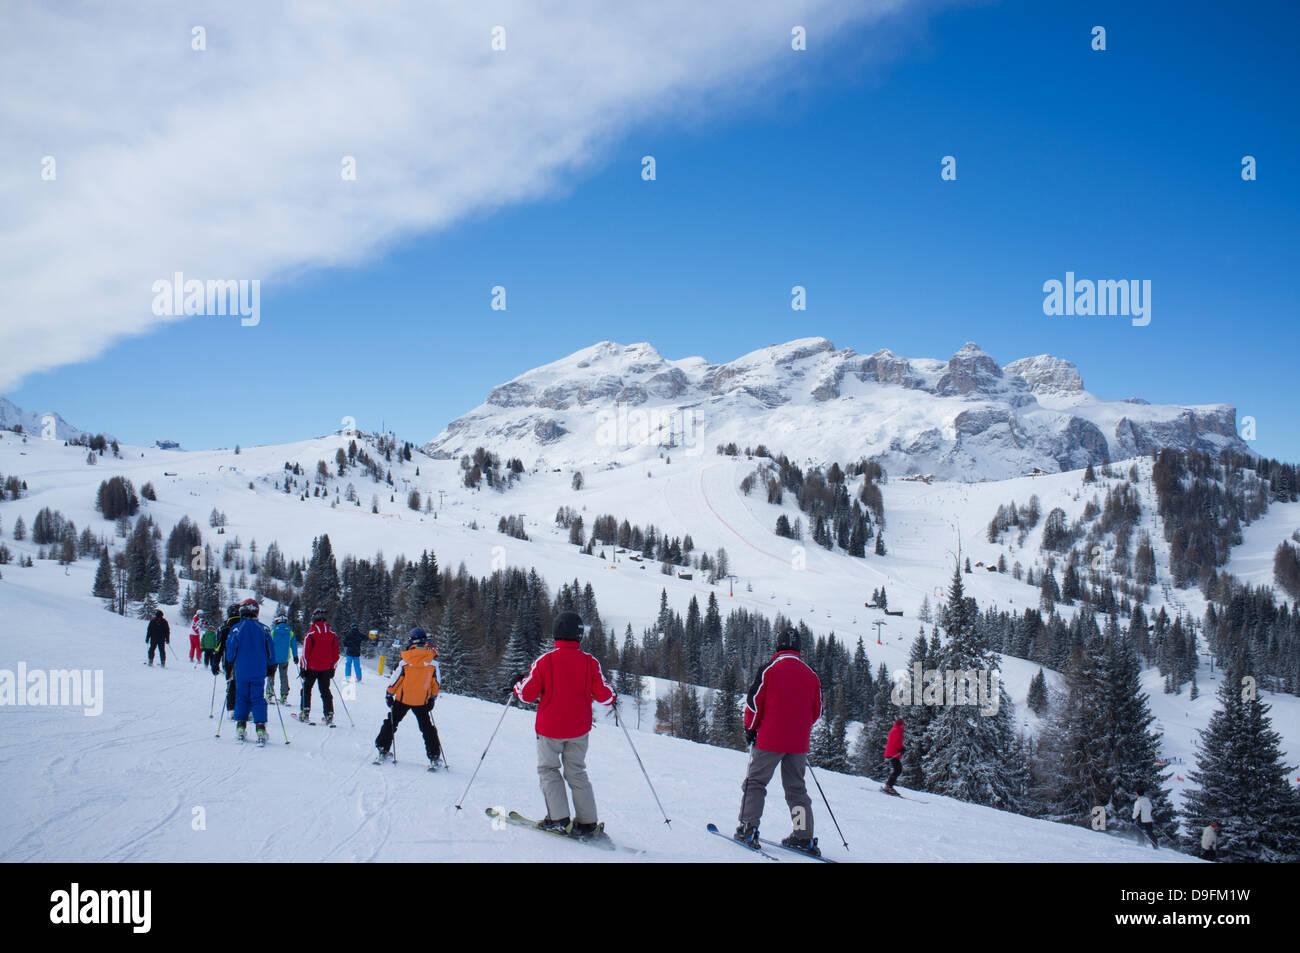 A group of skiers at the Alta Badia ski resort near Corvara, Dolomites, South Tyrol, Italy - Stock Image